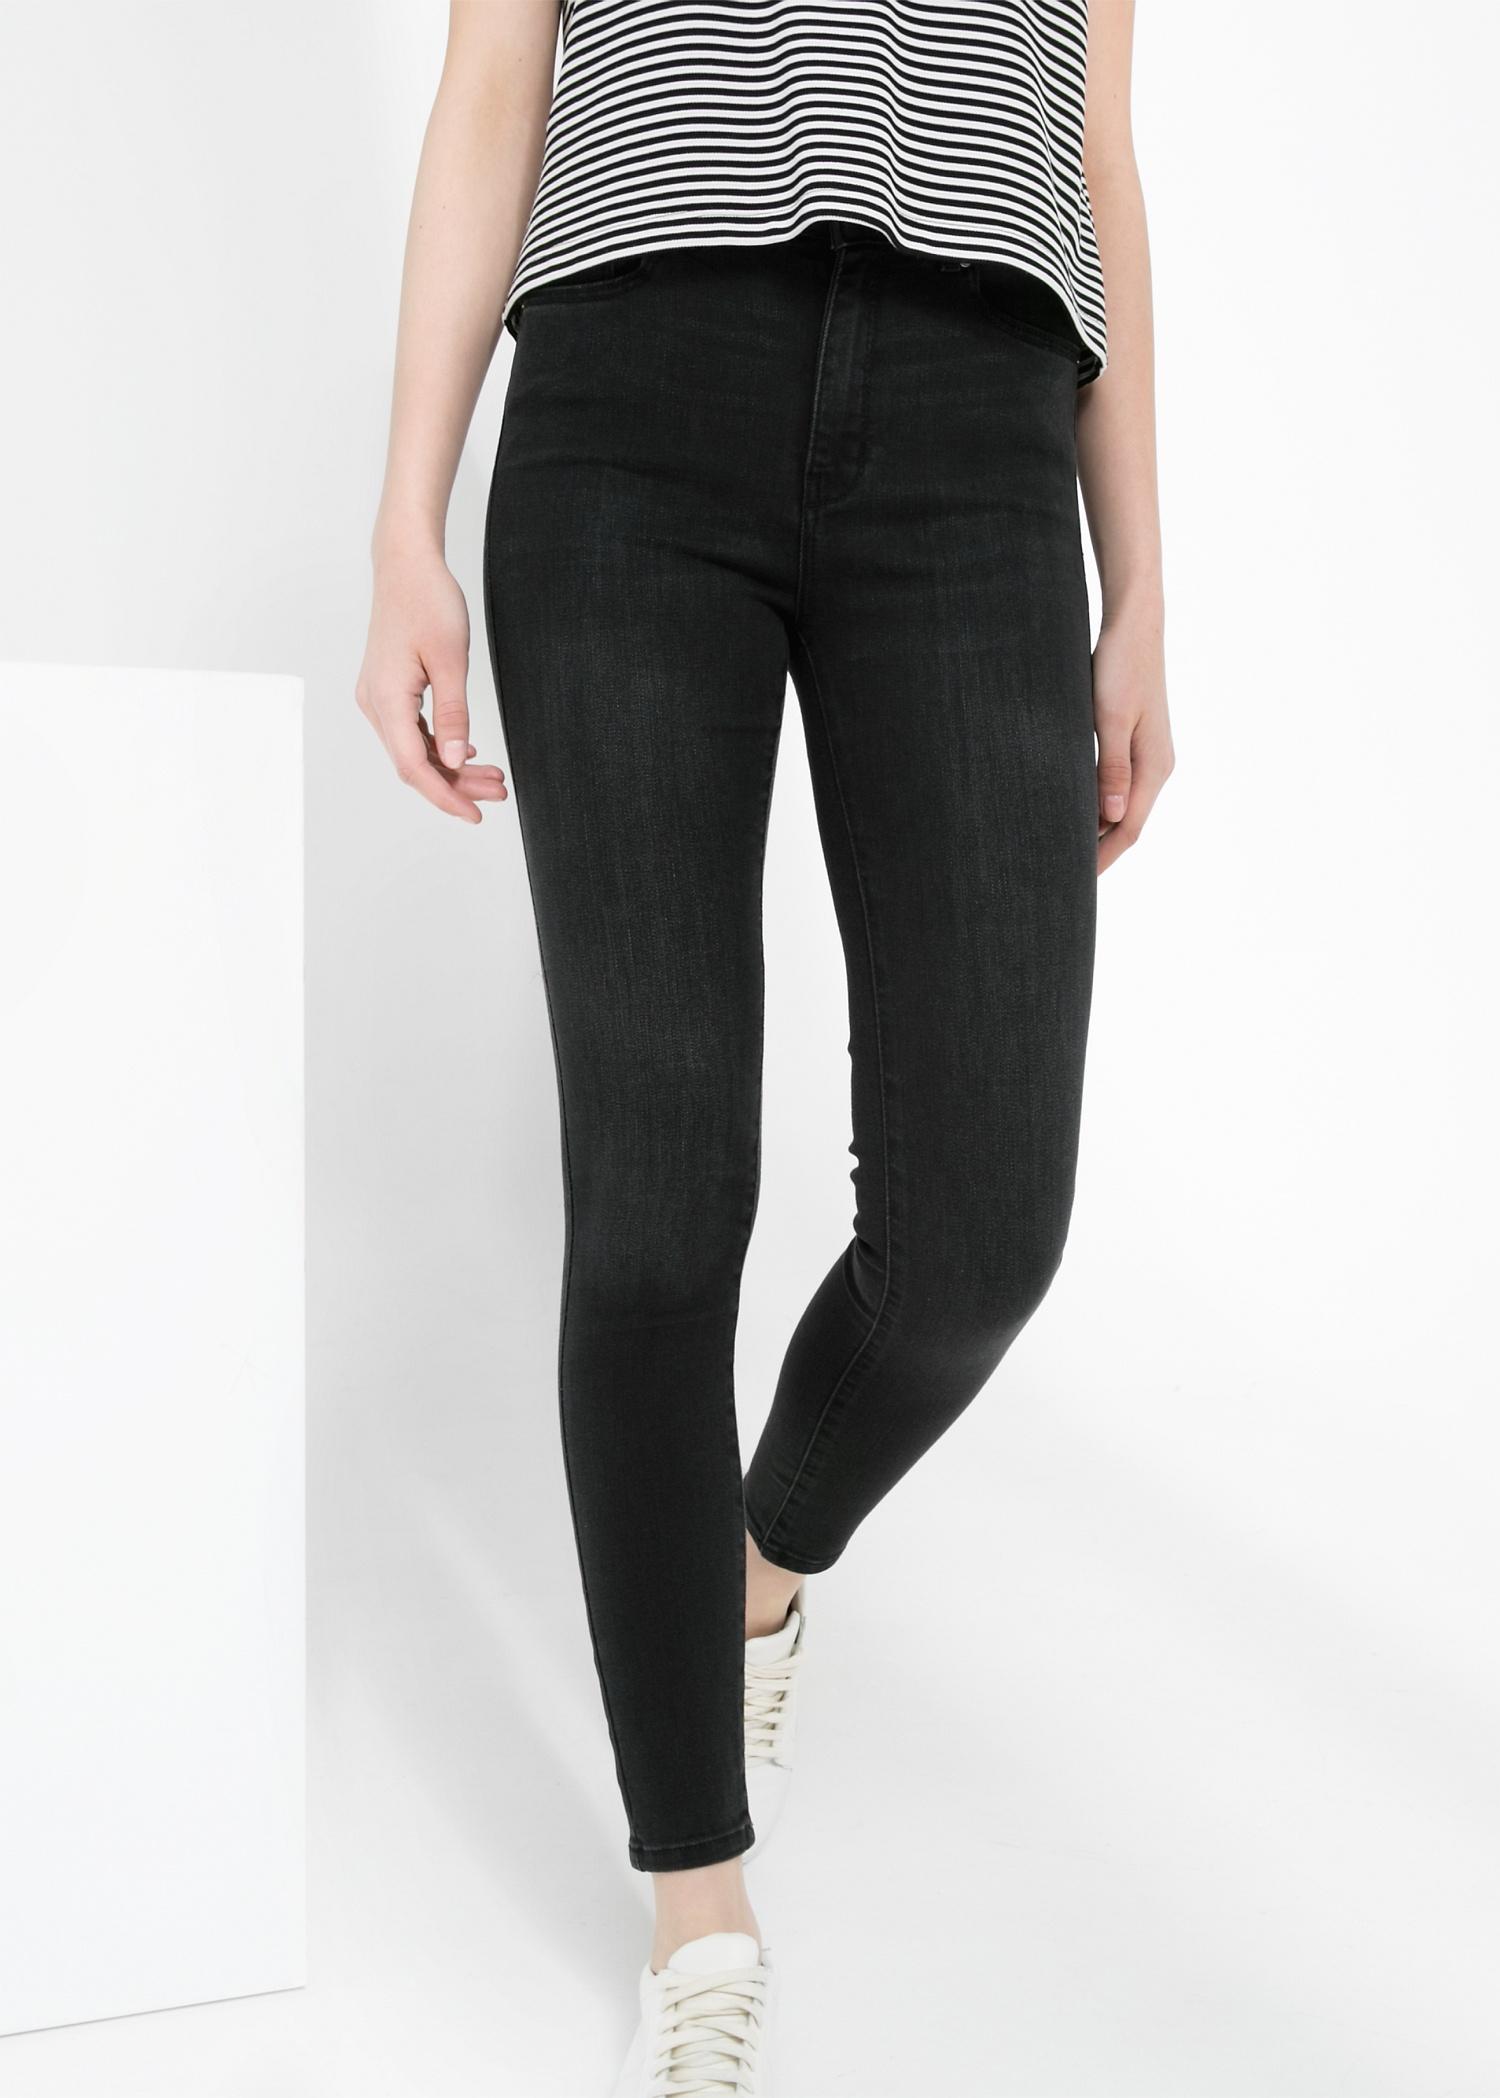 Jeans high waist broadway - Mujer | MANGO